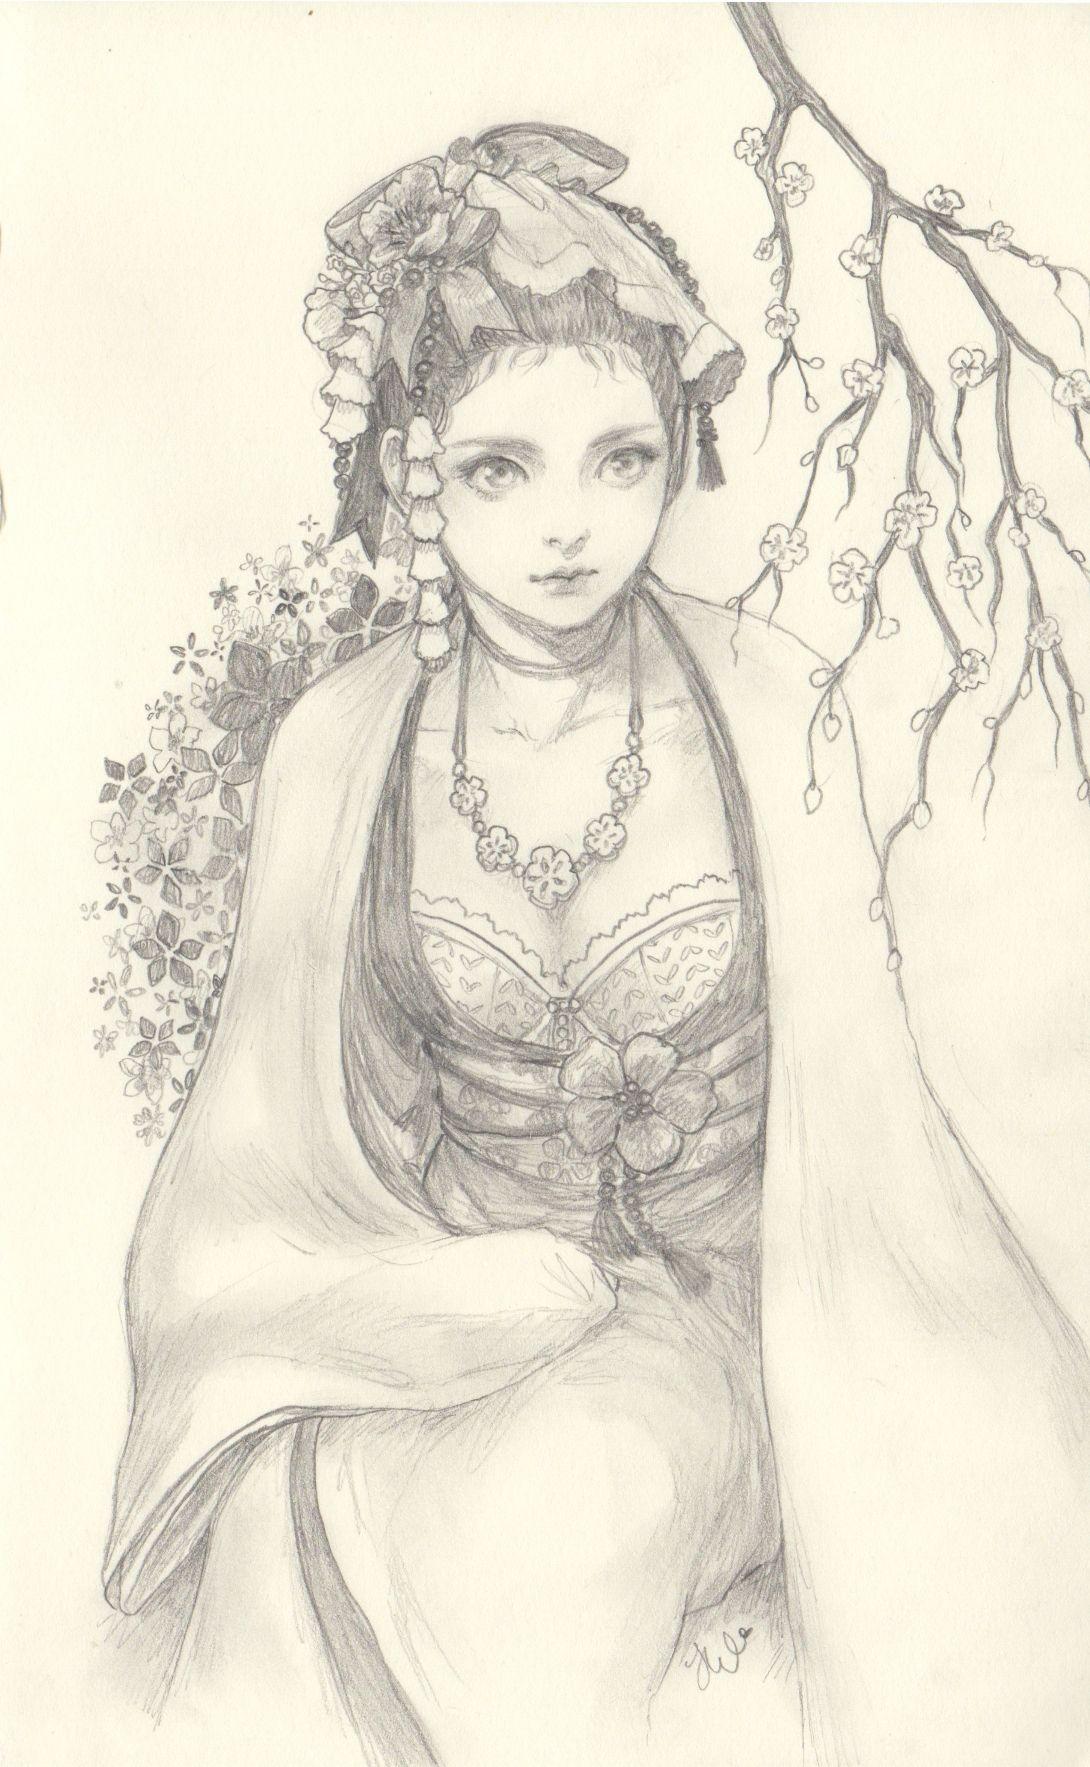 http://yasahime.tumblr.com | Jasmin Darnell | Pinterest | Tattoo ...